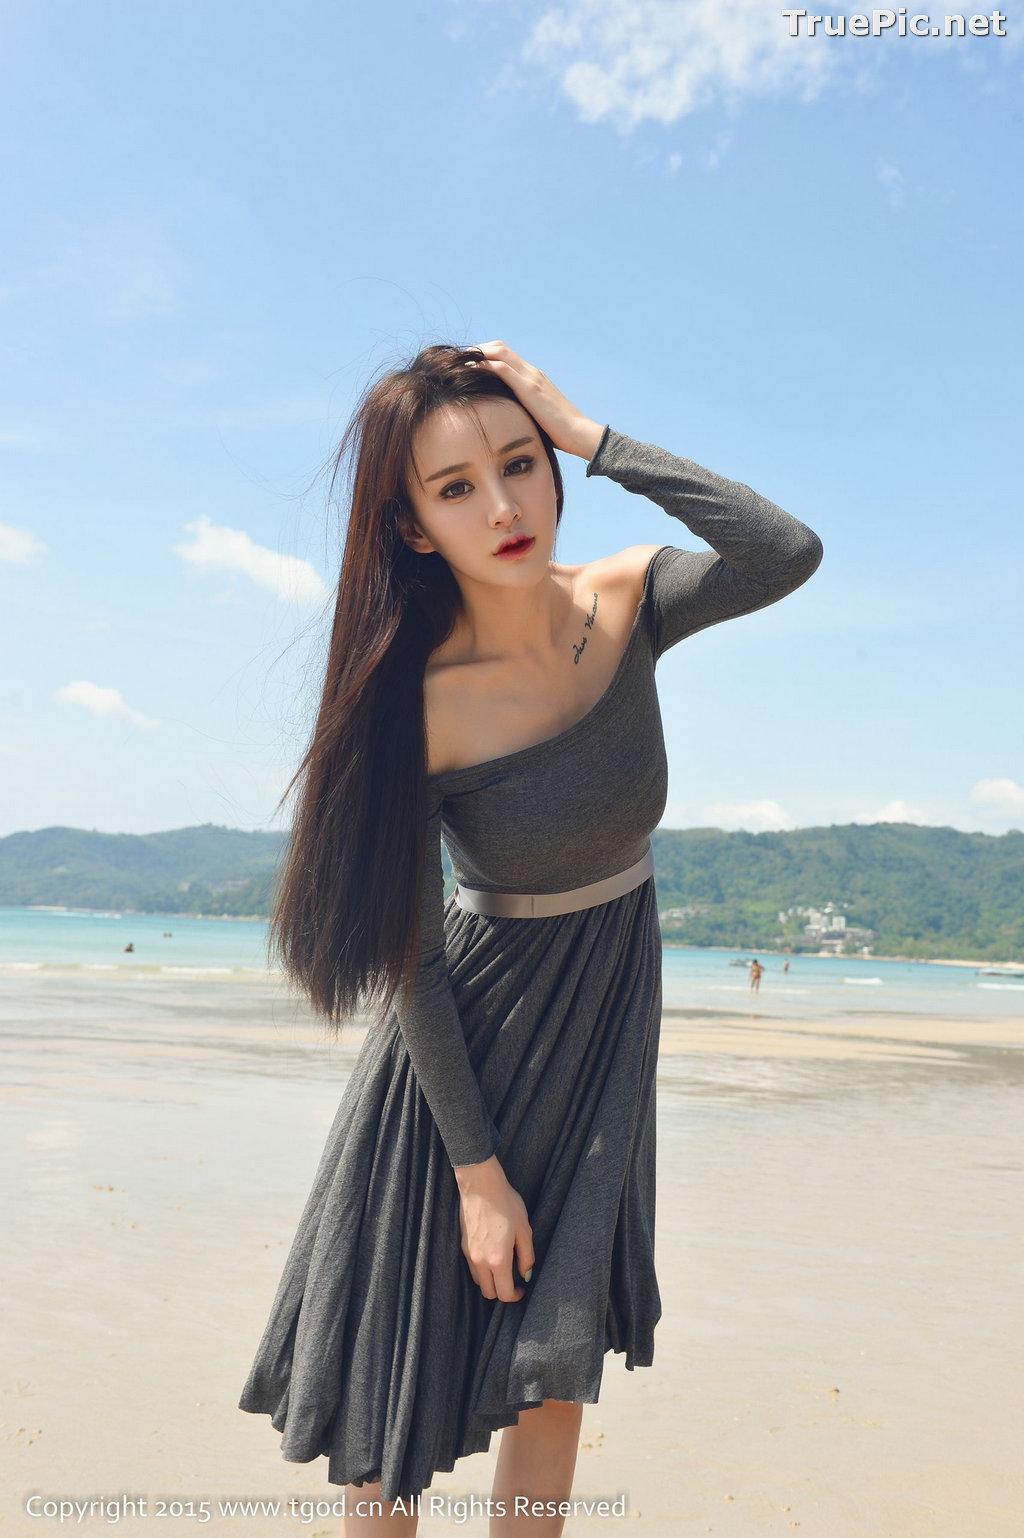 Image TGOD 2015-11-10 - Chinese Sexy Model - Cheryl (青树) - TruePic.net - Picture-48